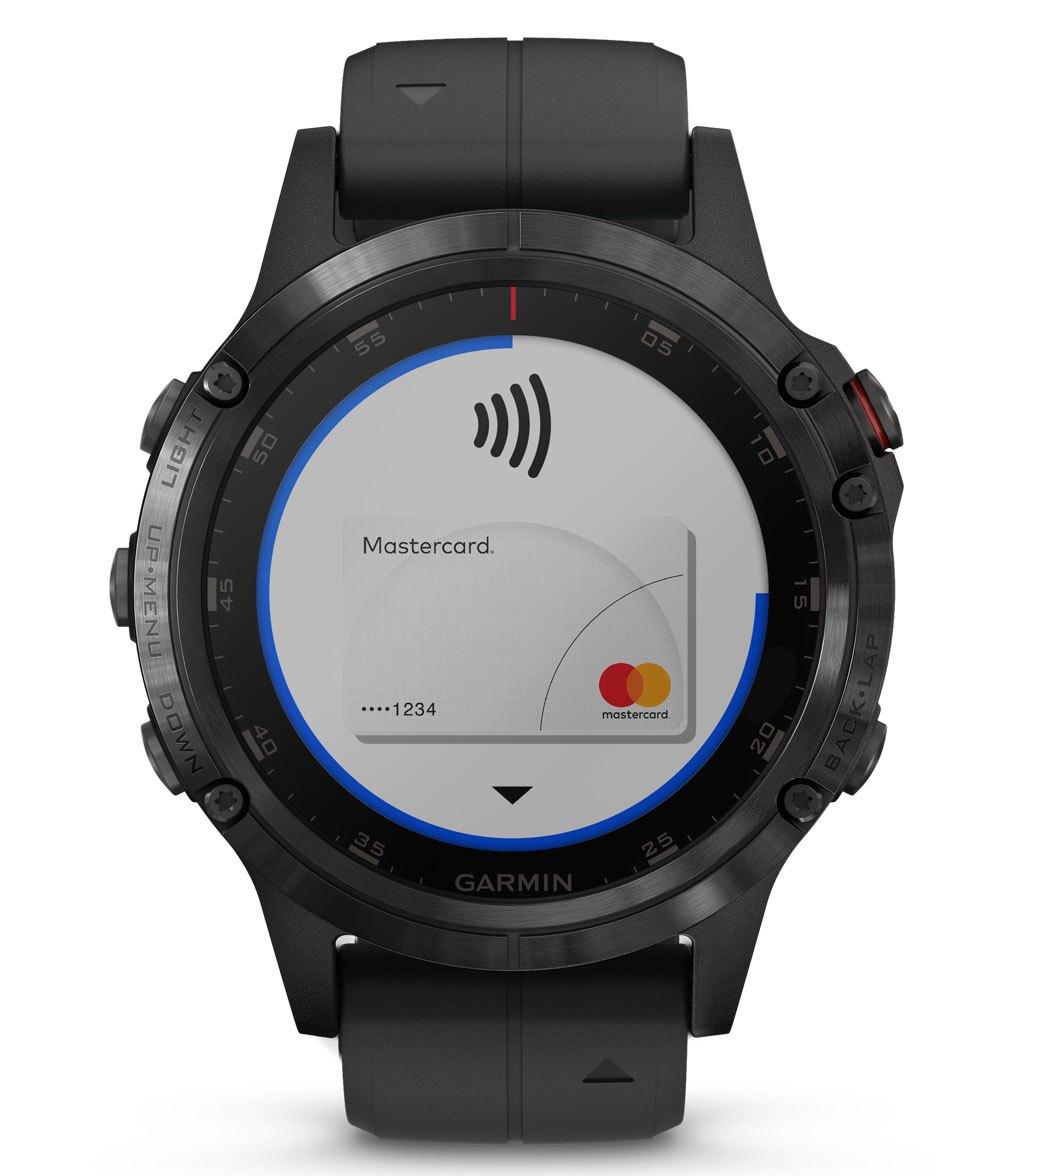 02a19e3825ba Garmin Fenix 5x Plus Sapphire Mutli-Sport GPS Watch at SwimOutlet ...